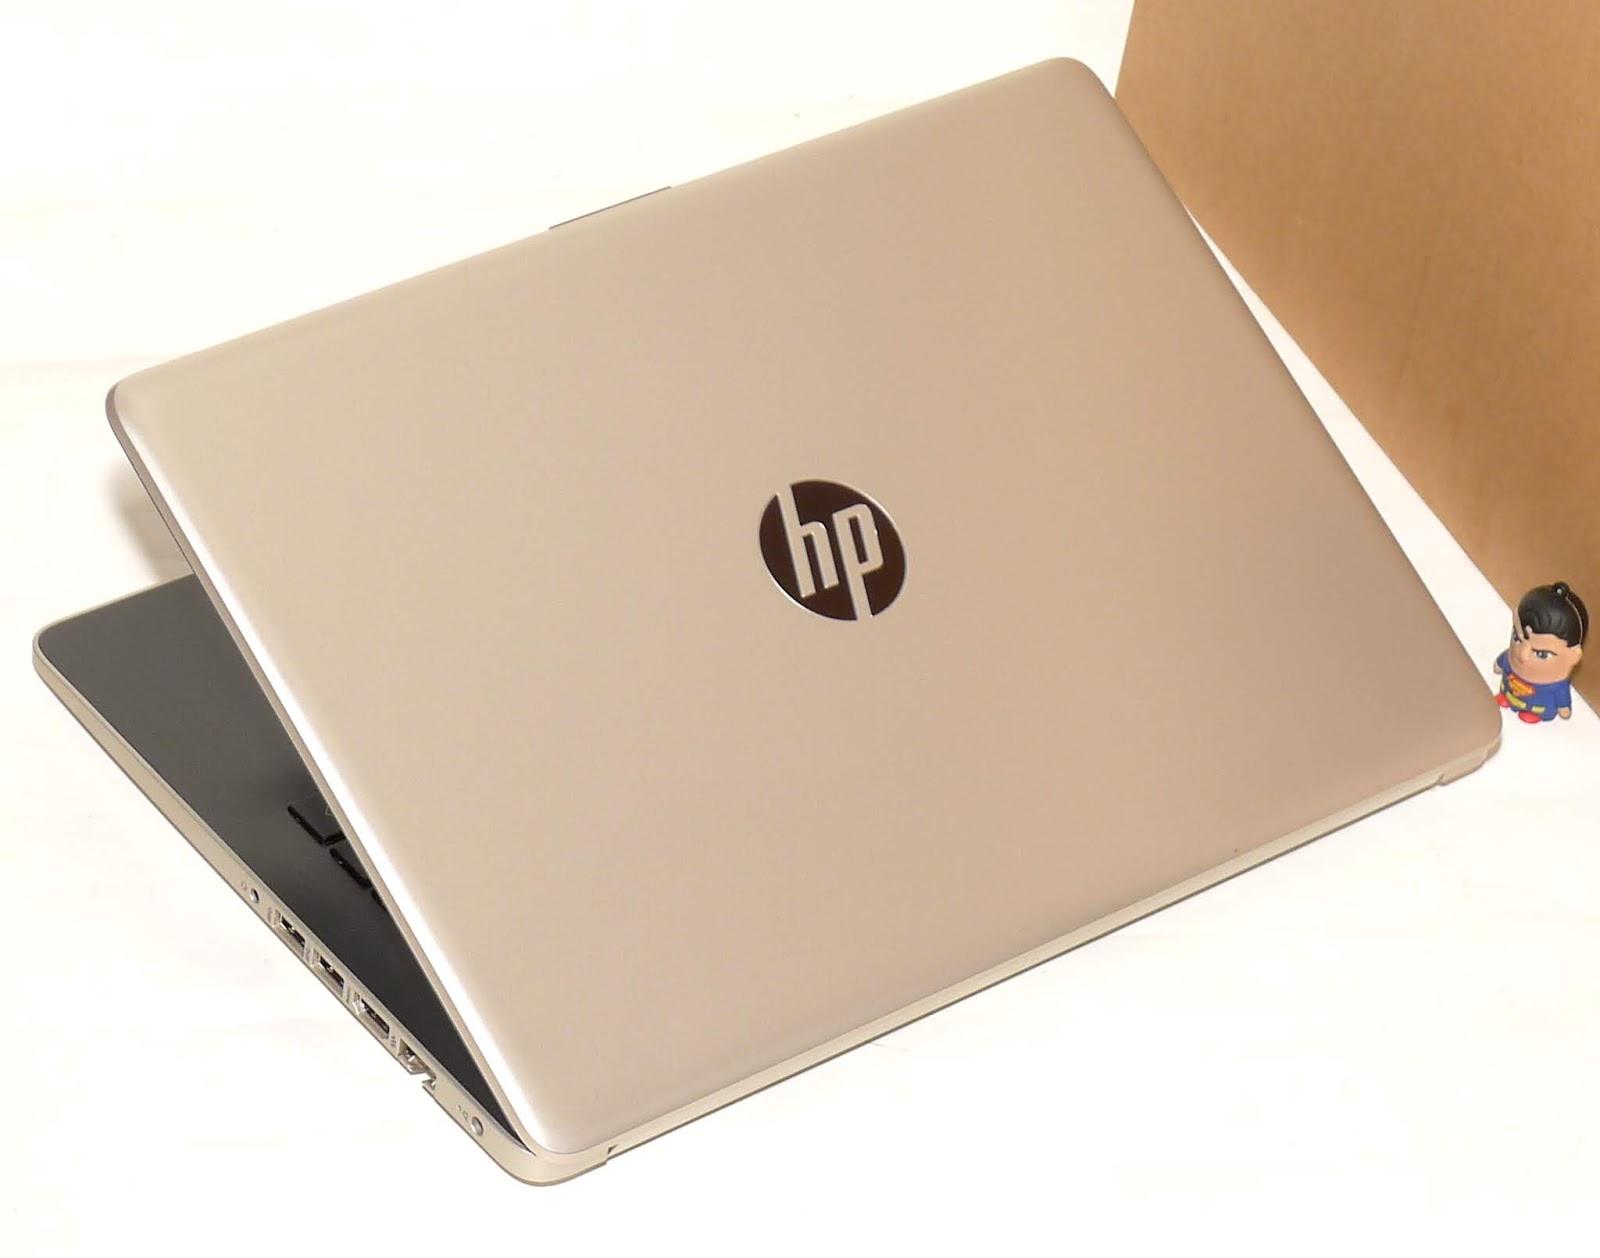 Jual Laptop Baru Hp 14 Cm0068au Amd A9 Malang Jual Beli Laptop Bekas Kamera Service Sparepart Di Malang